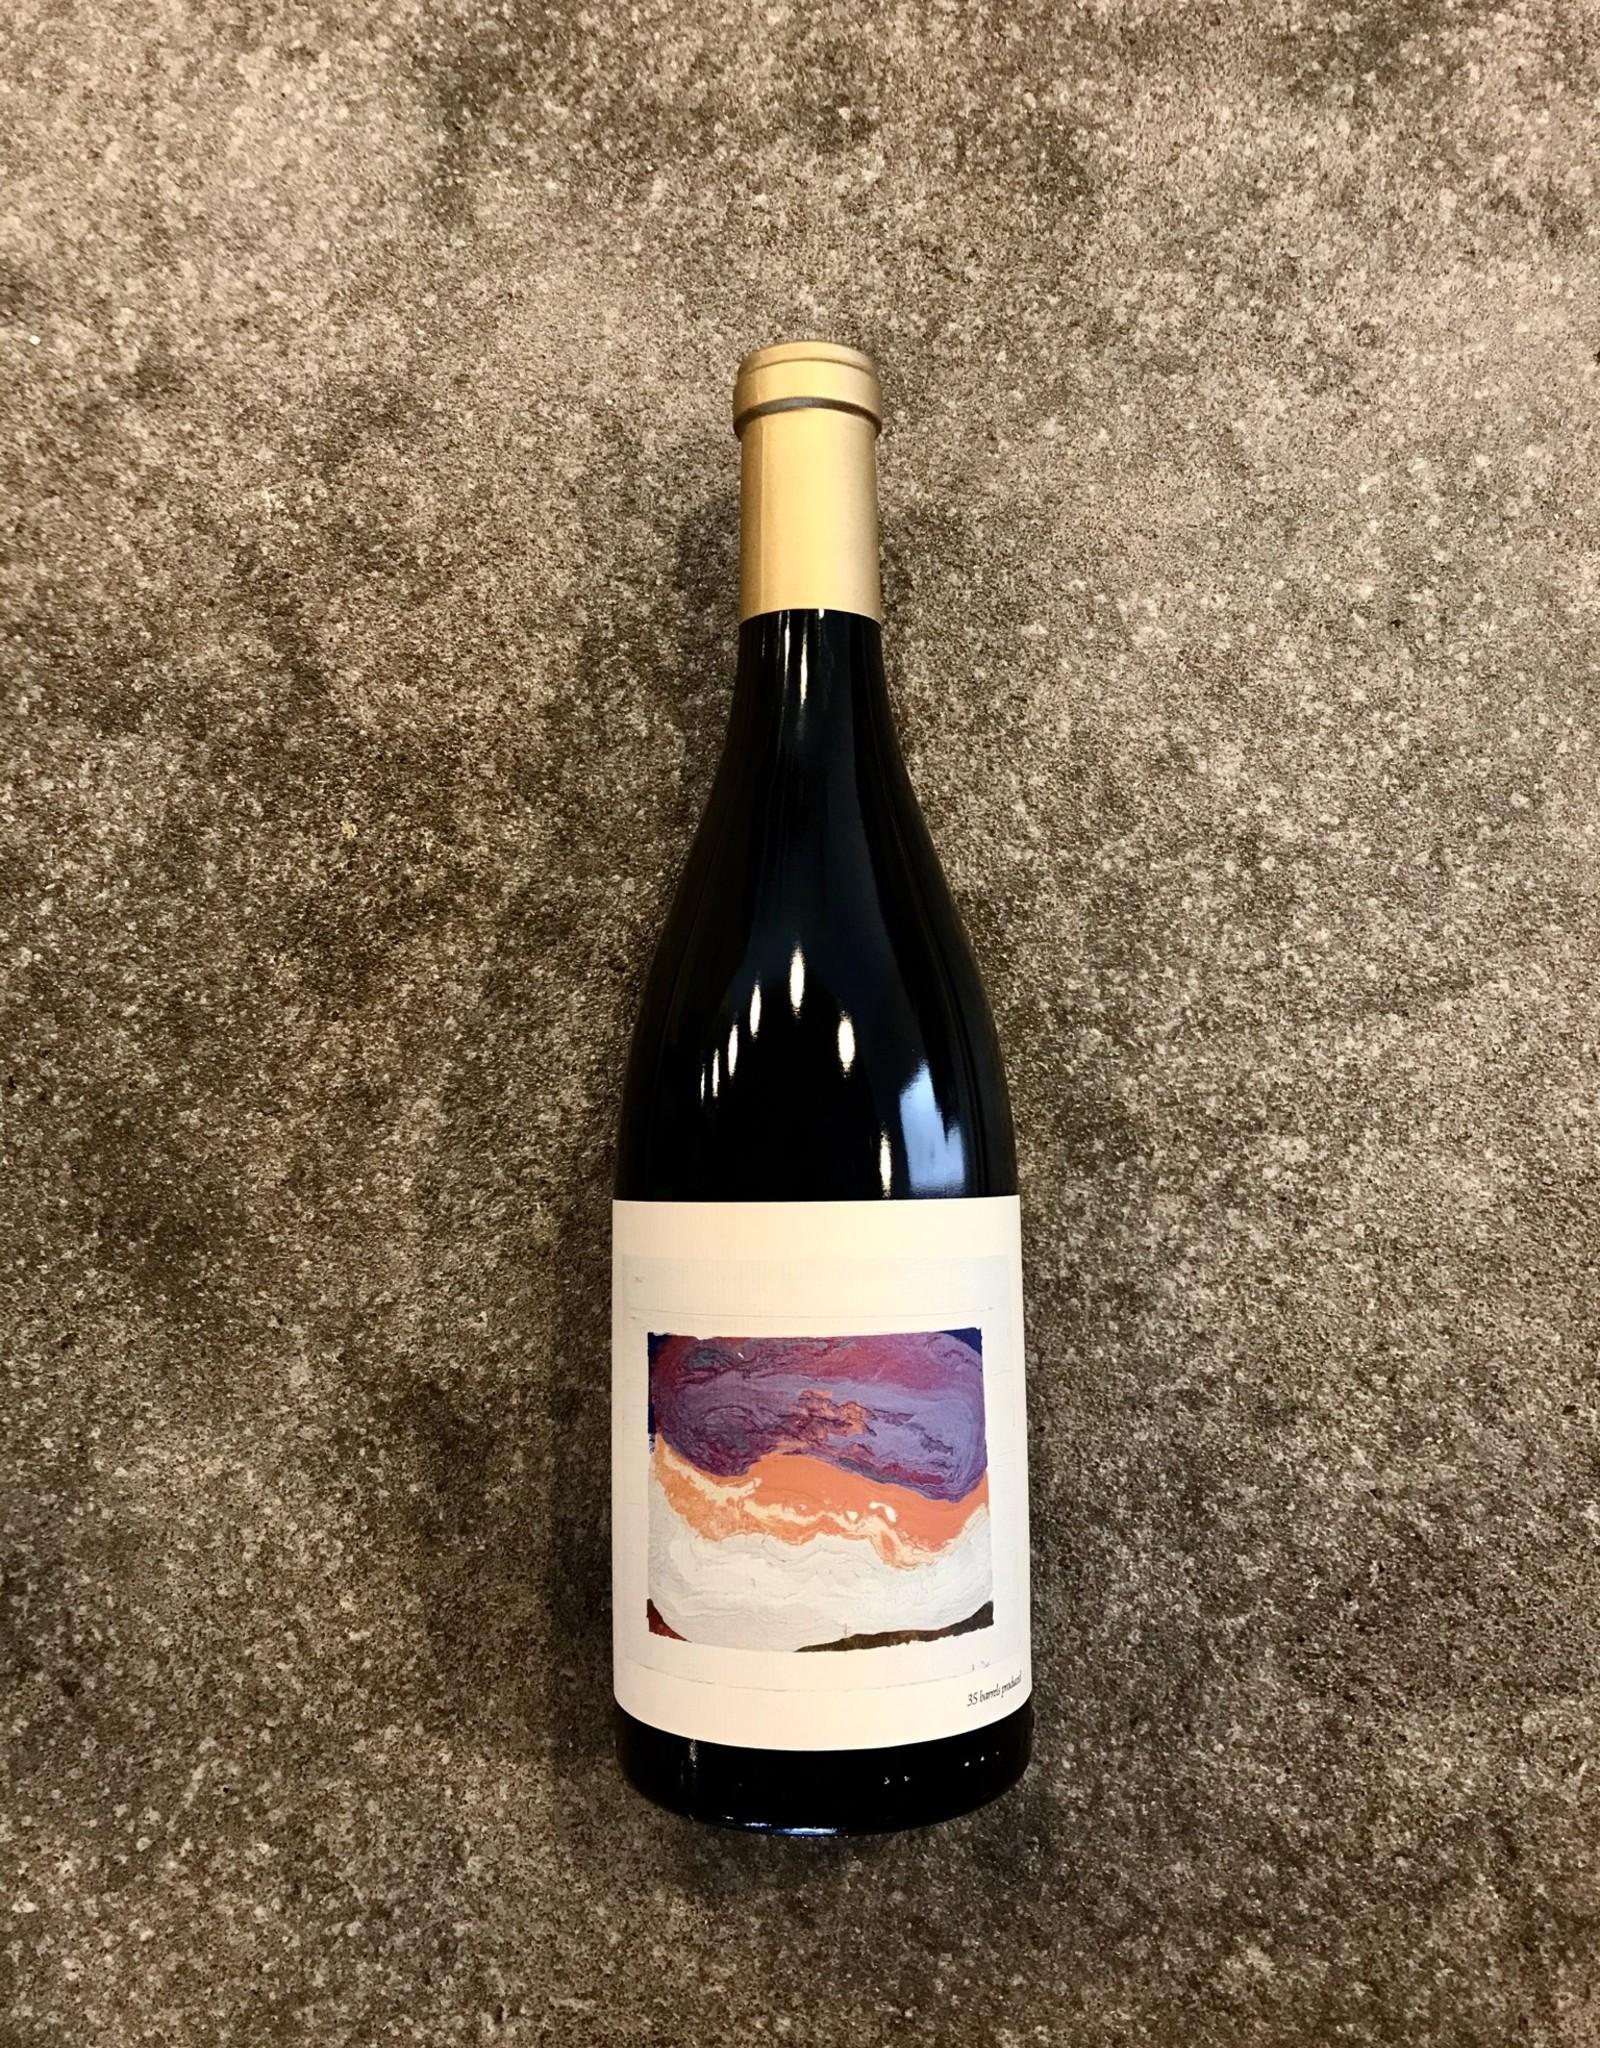 Chanin Bien Nacido Vineyard Chardonnay 2017